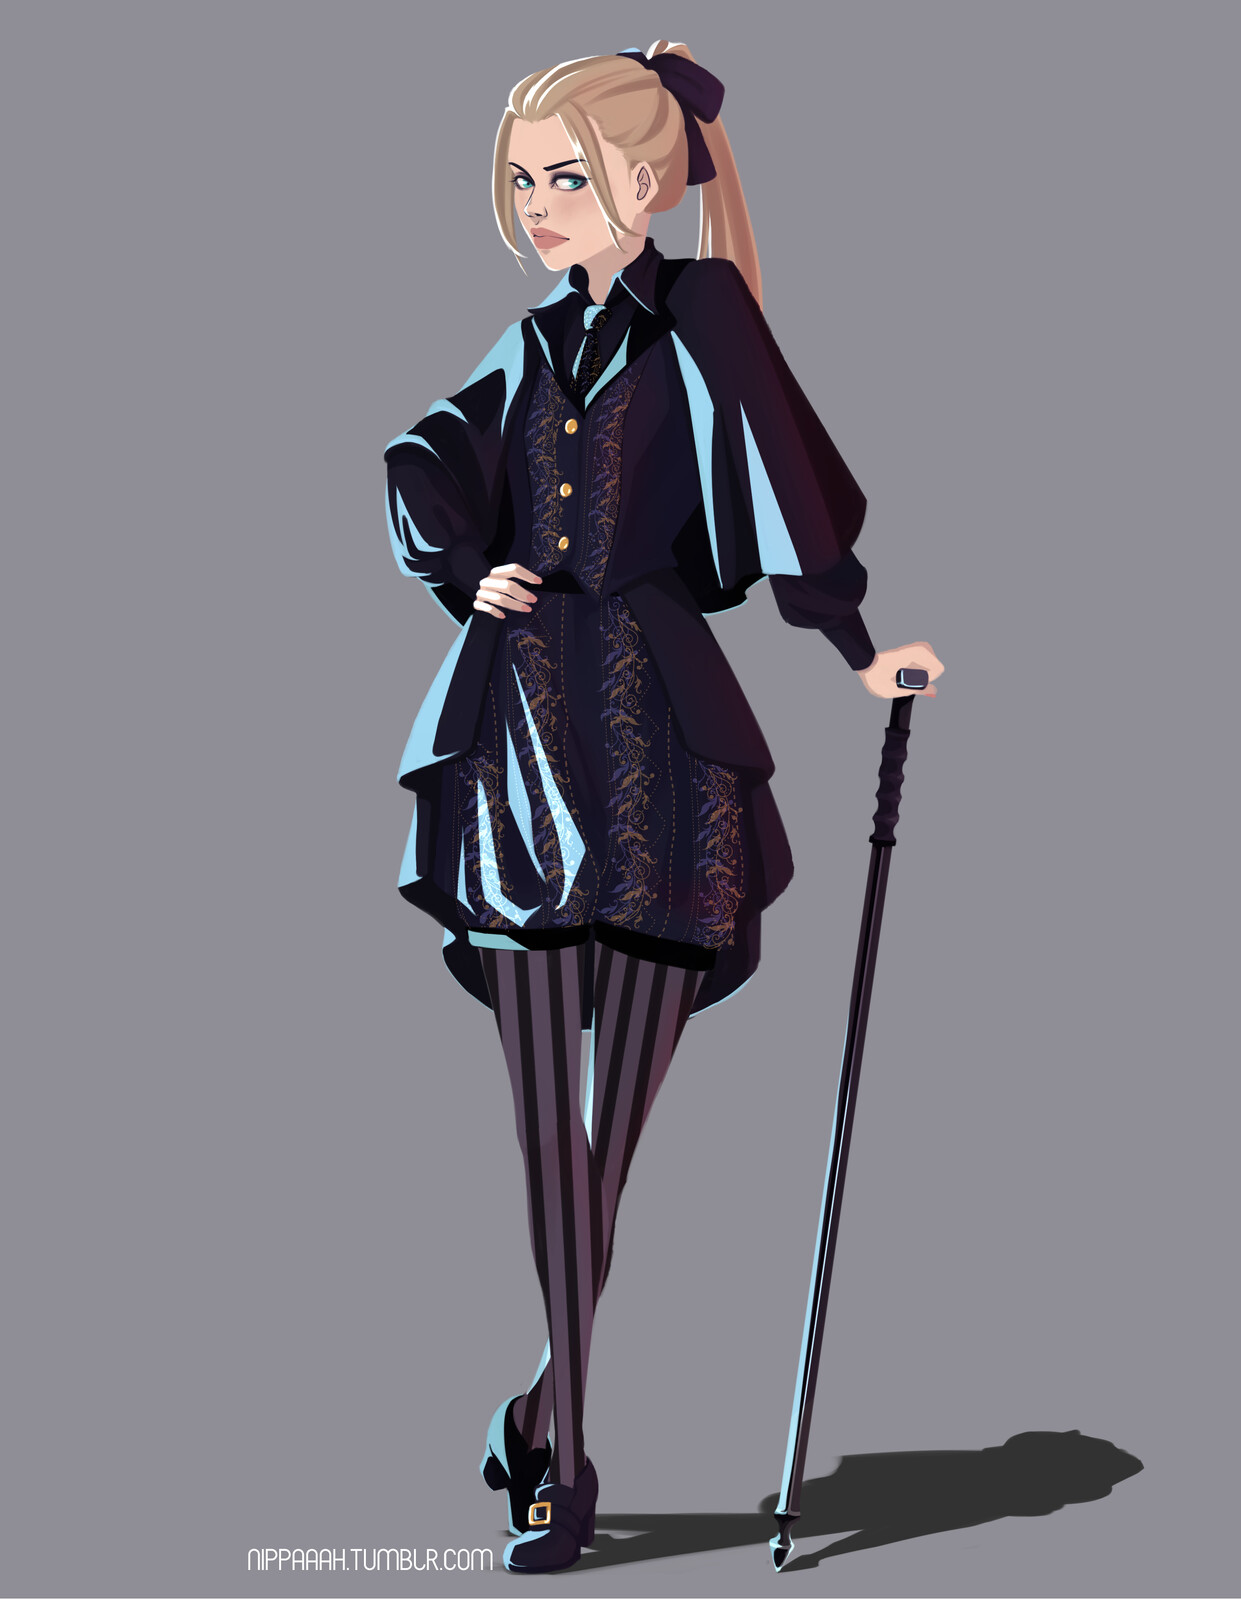 Alternate Outfit: Lolita